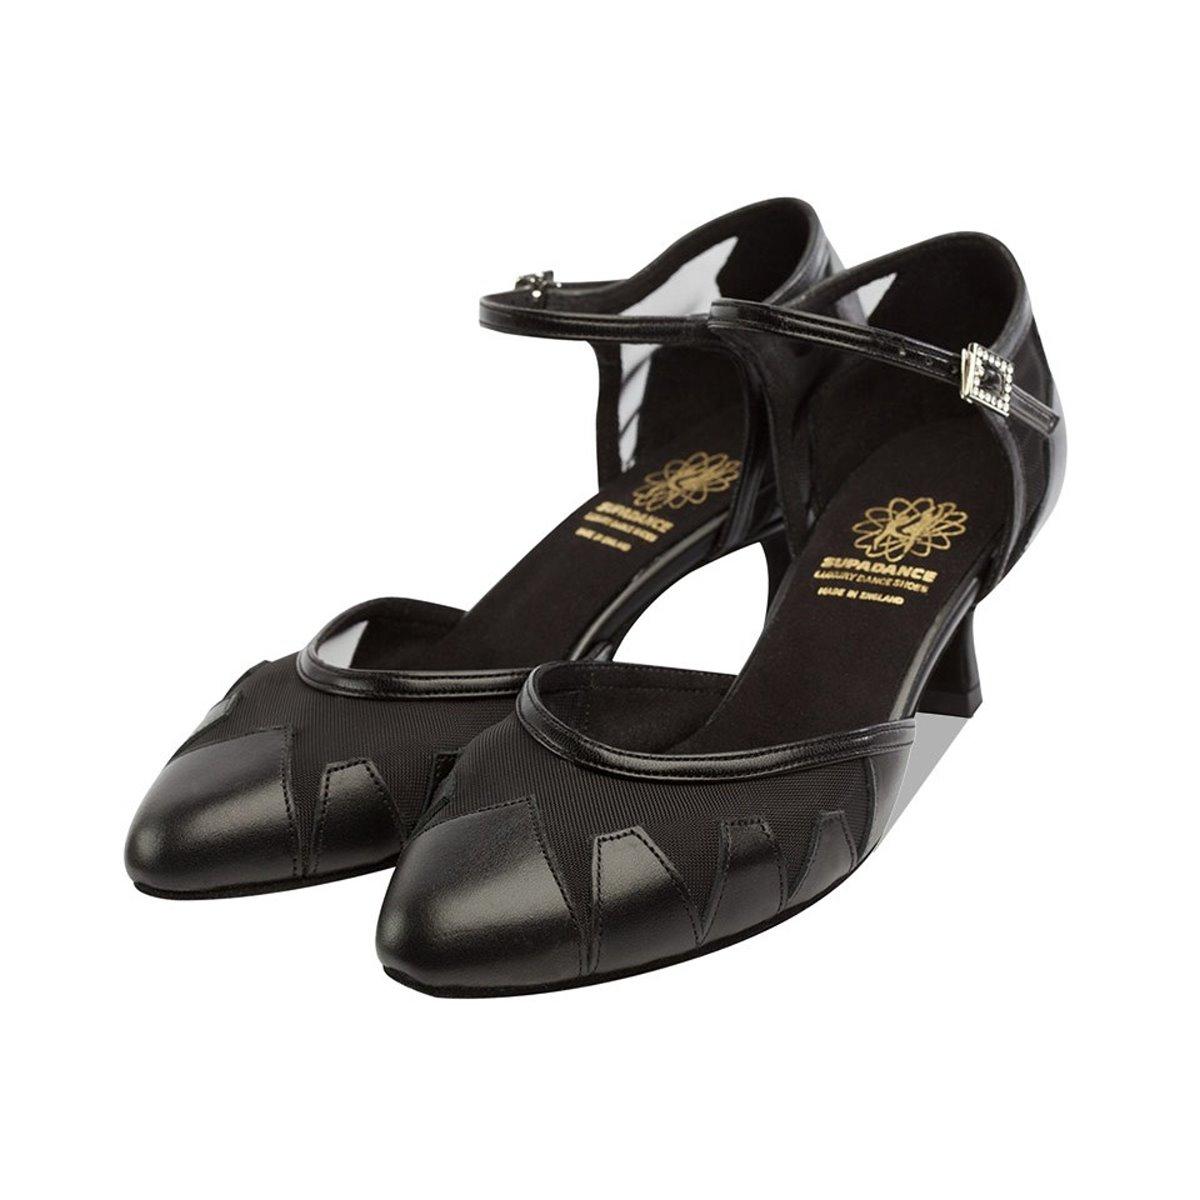 Supadance Shoes Ladies